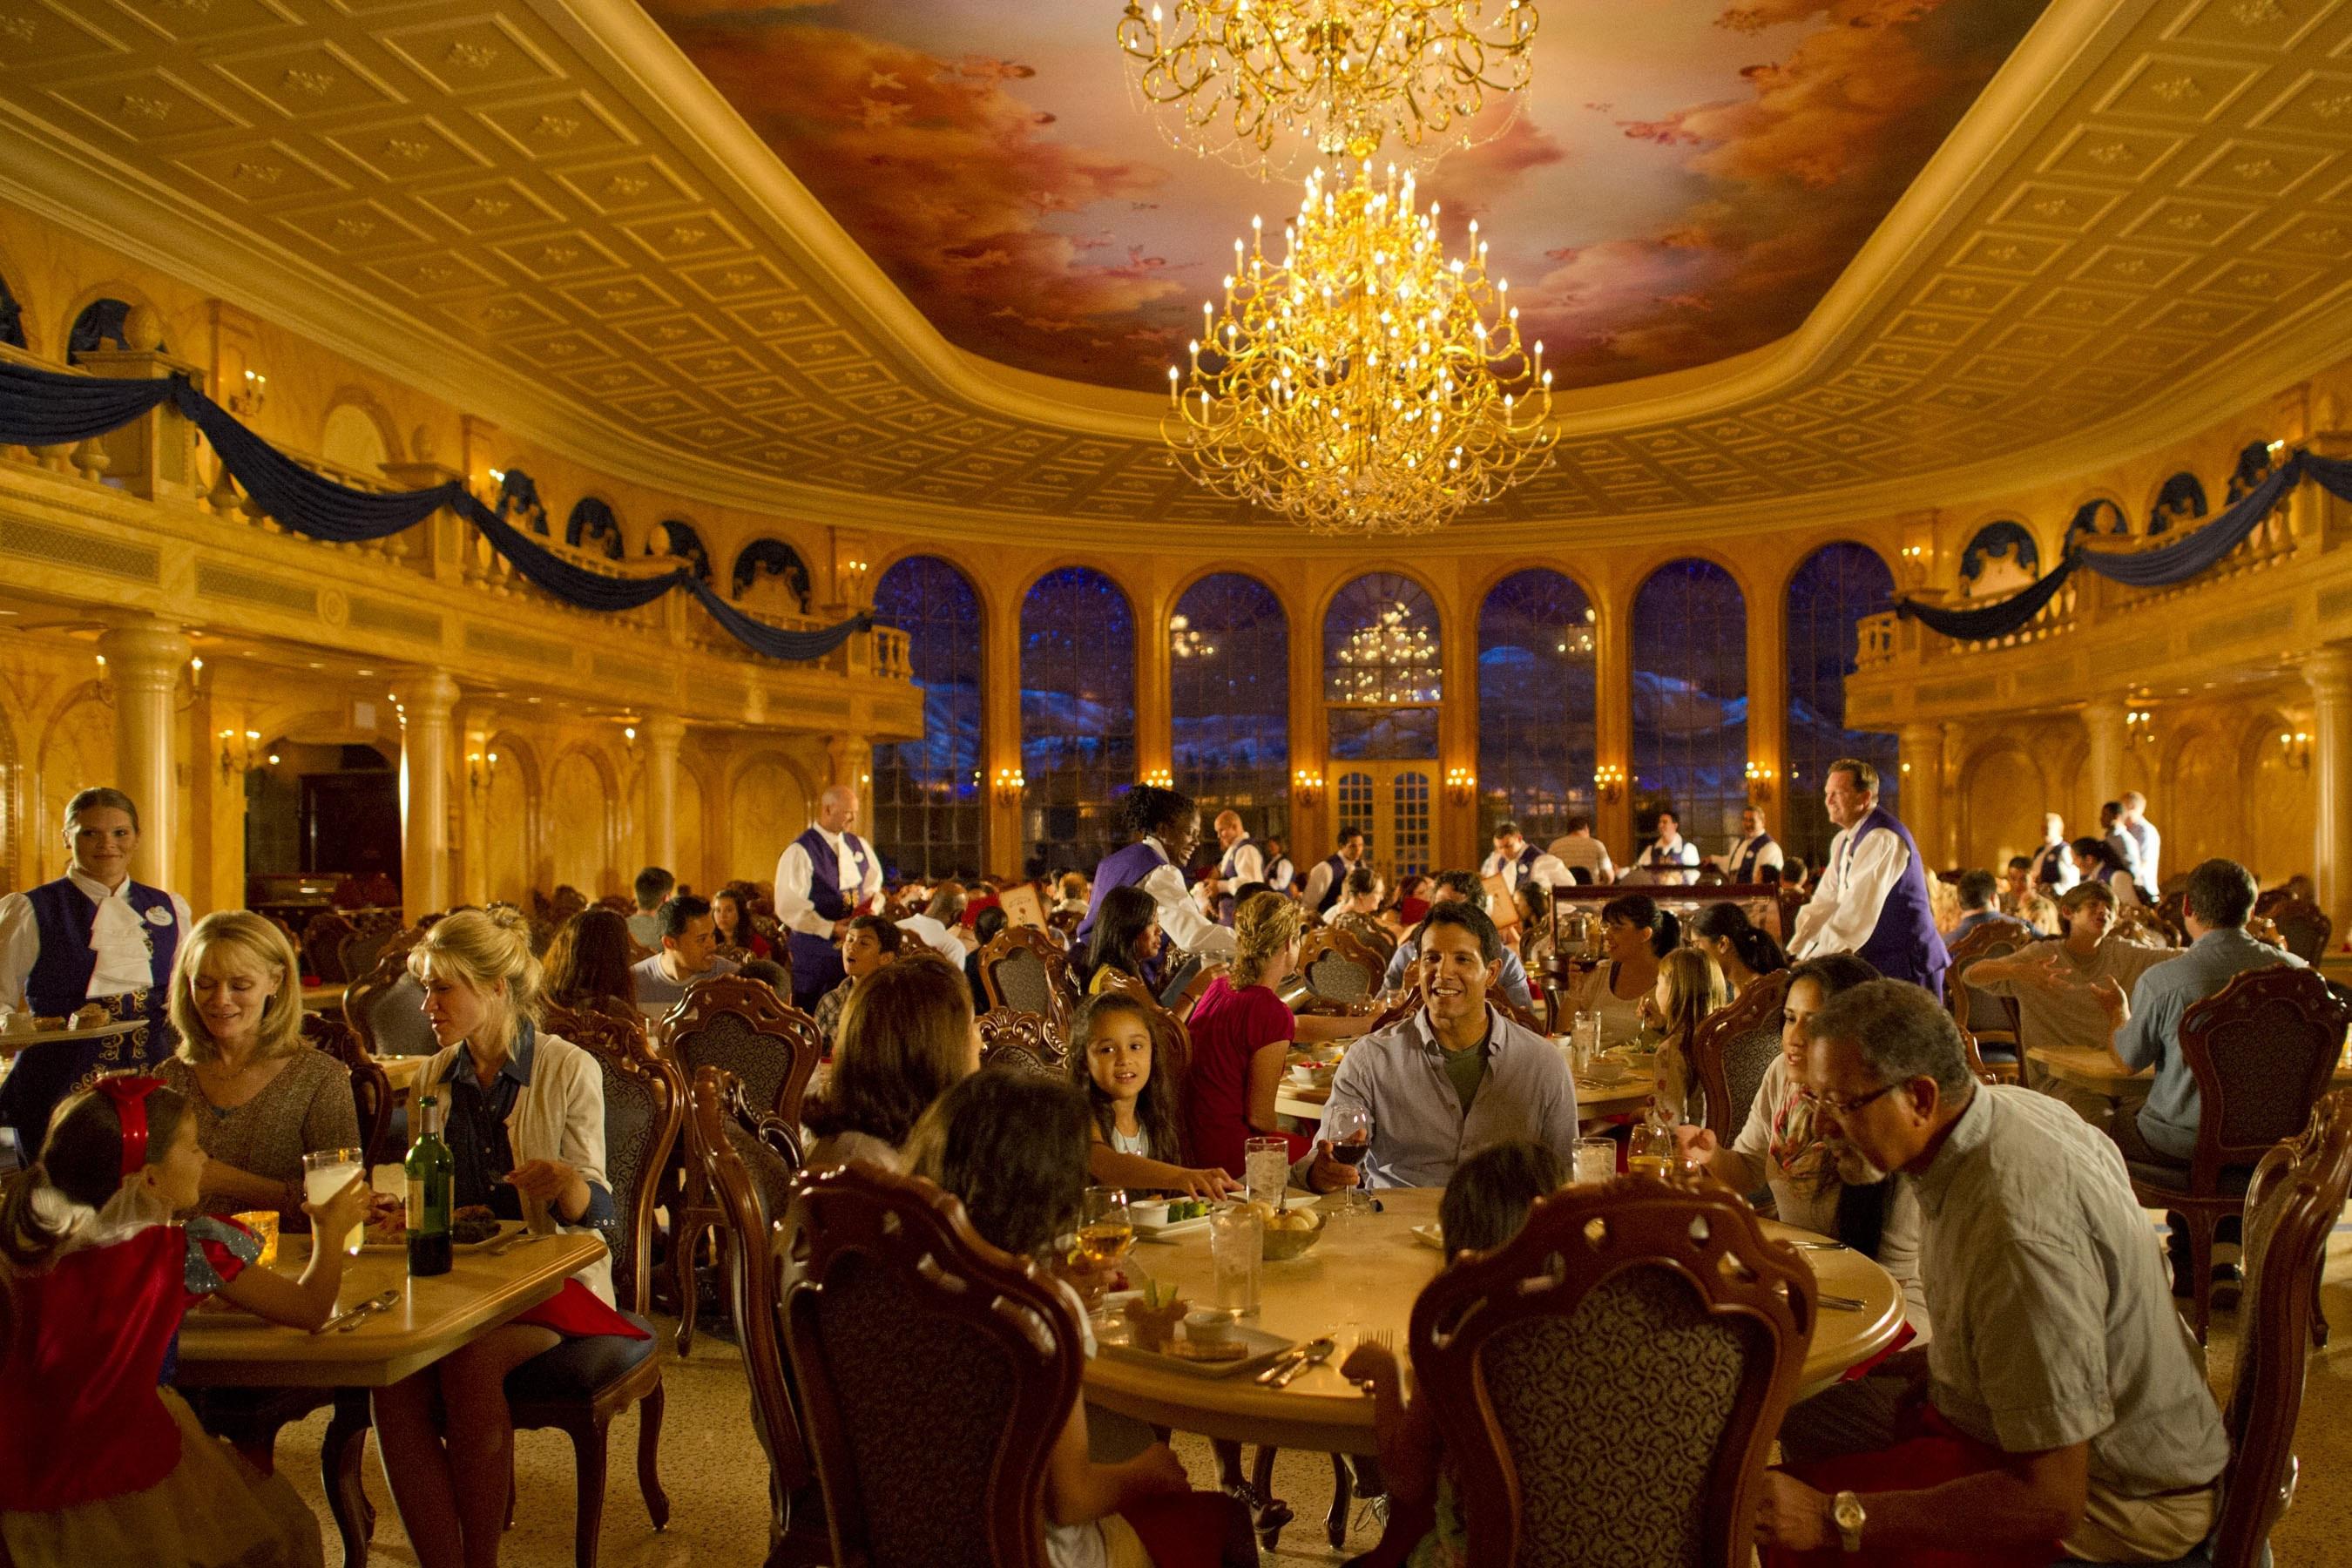 【WDW】大人気!ビー・アワー・ゲスト・レストラン体験談!利用方法&魅力まとめ!グリーティングも実施!